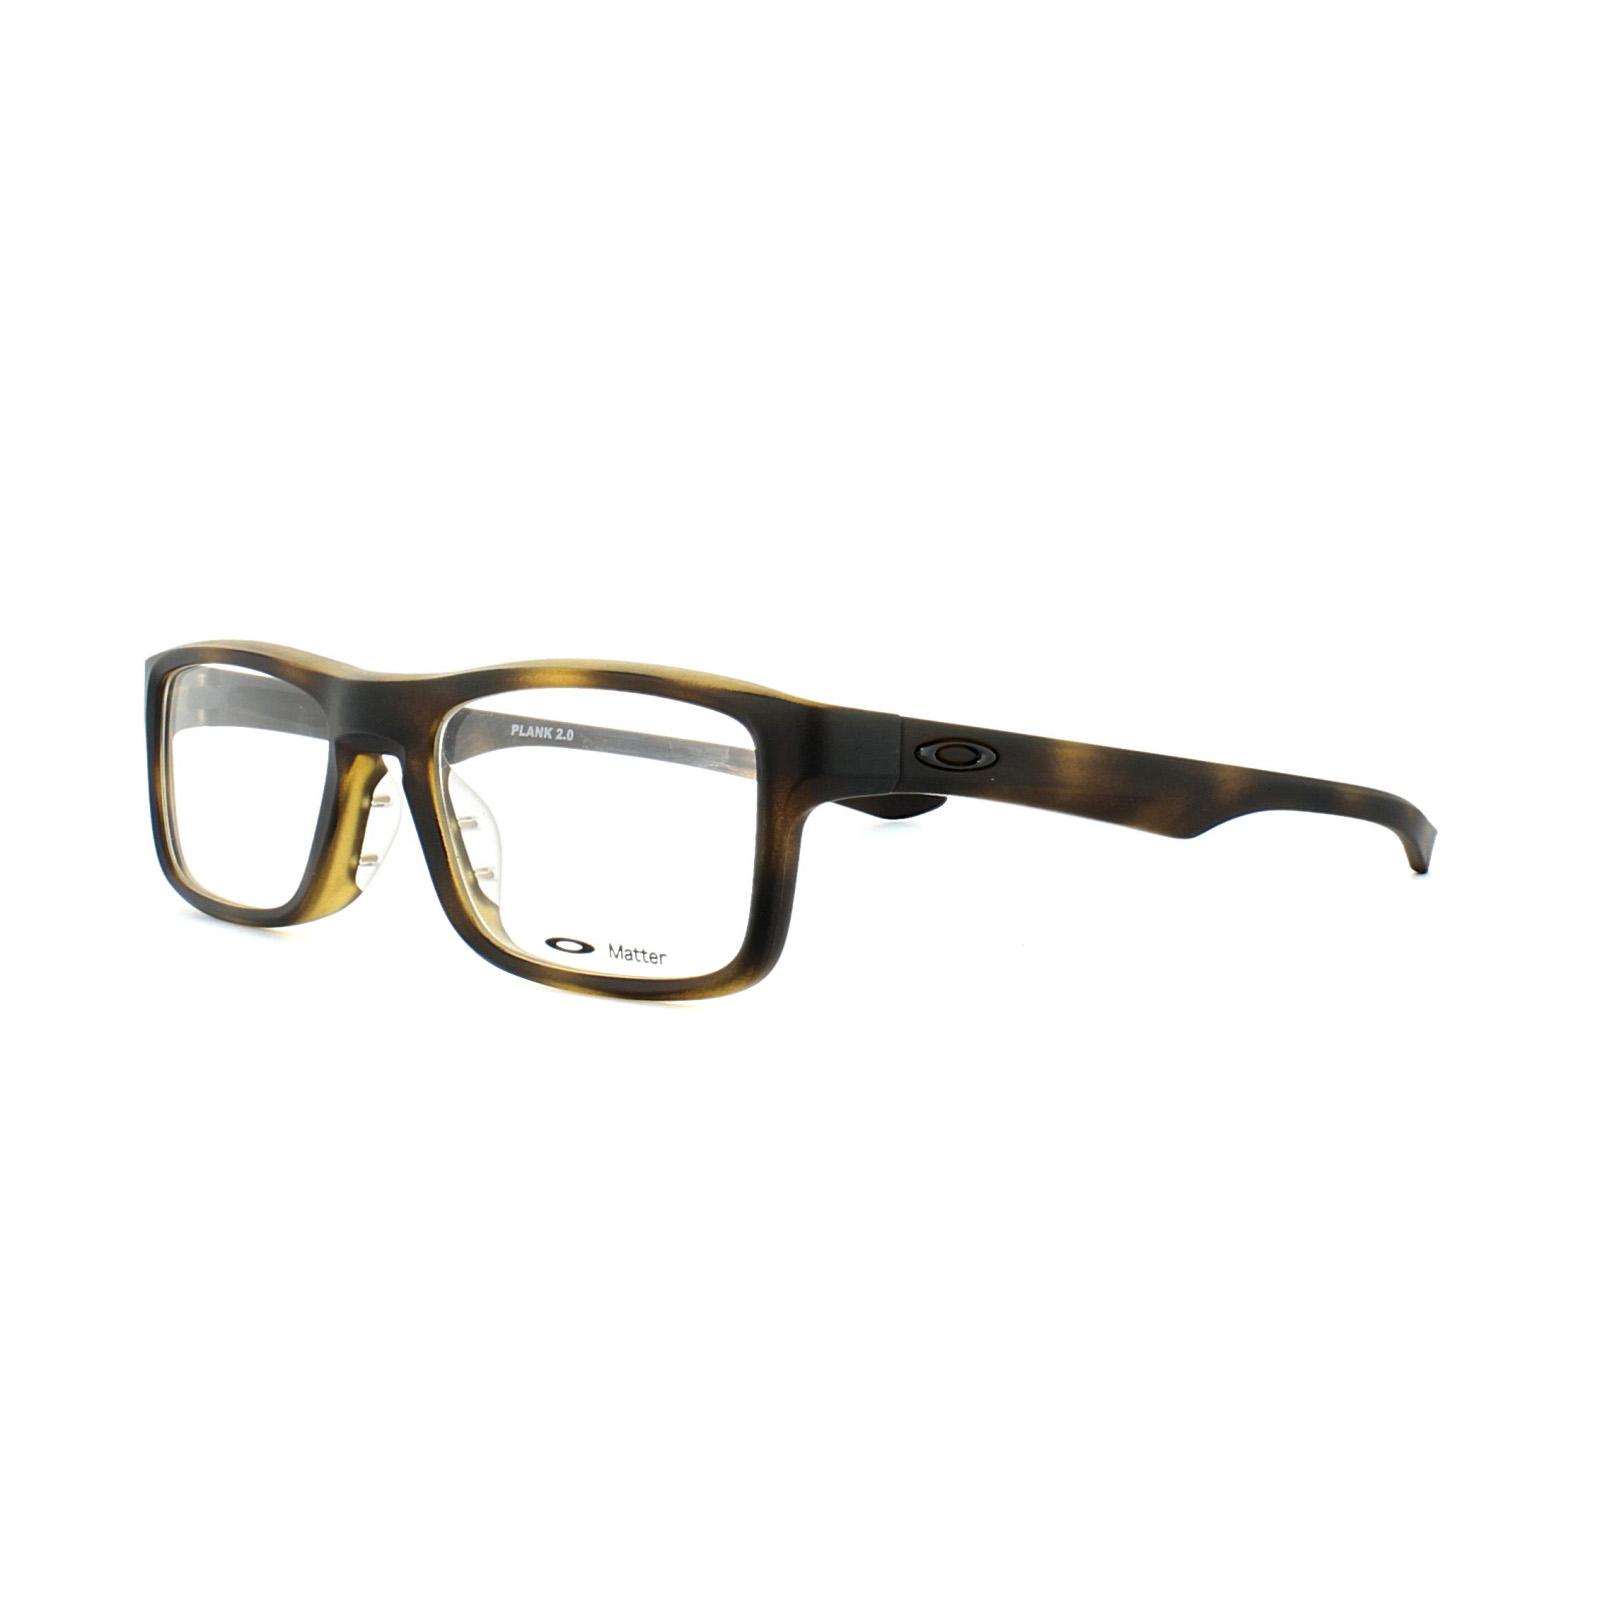 9f6dffe67b Sentinel Oakley Glasses Frames Plank 2.0 OX8081-04 Brown Tortoise